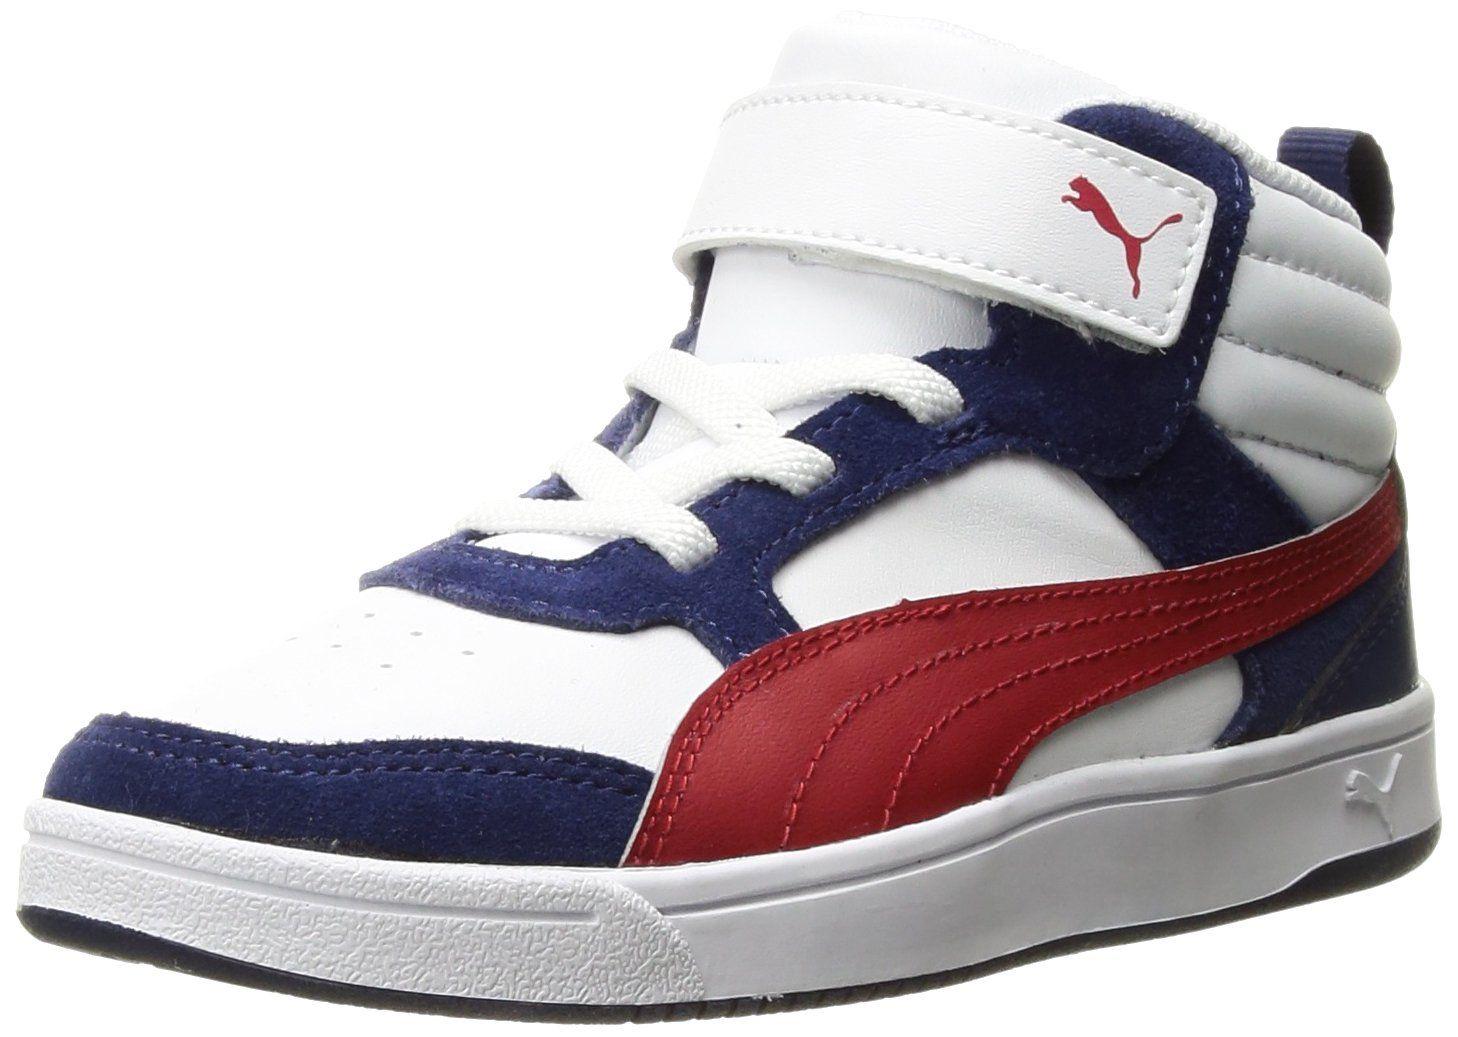 Toddler. Rebound^Signature Puma Sneaker